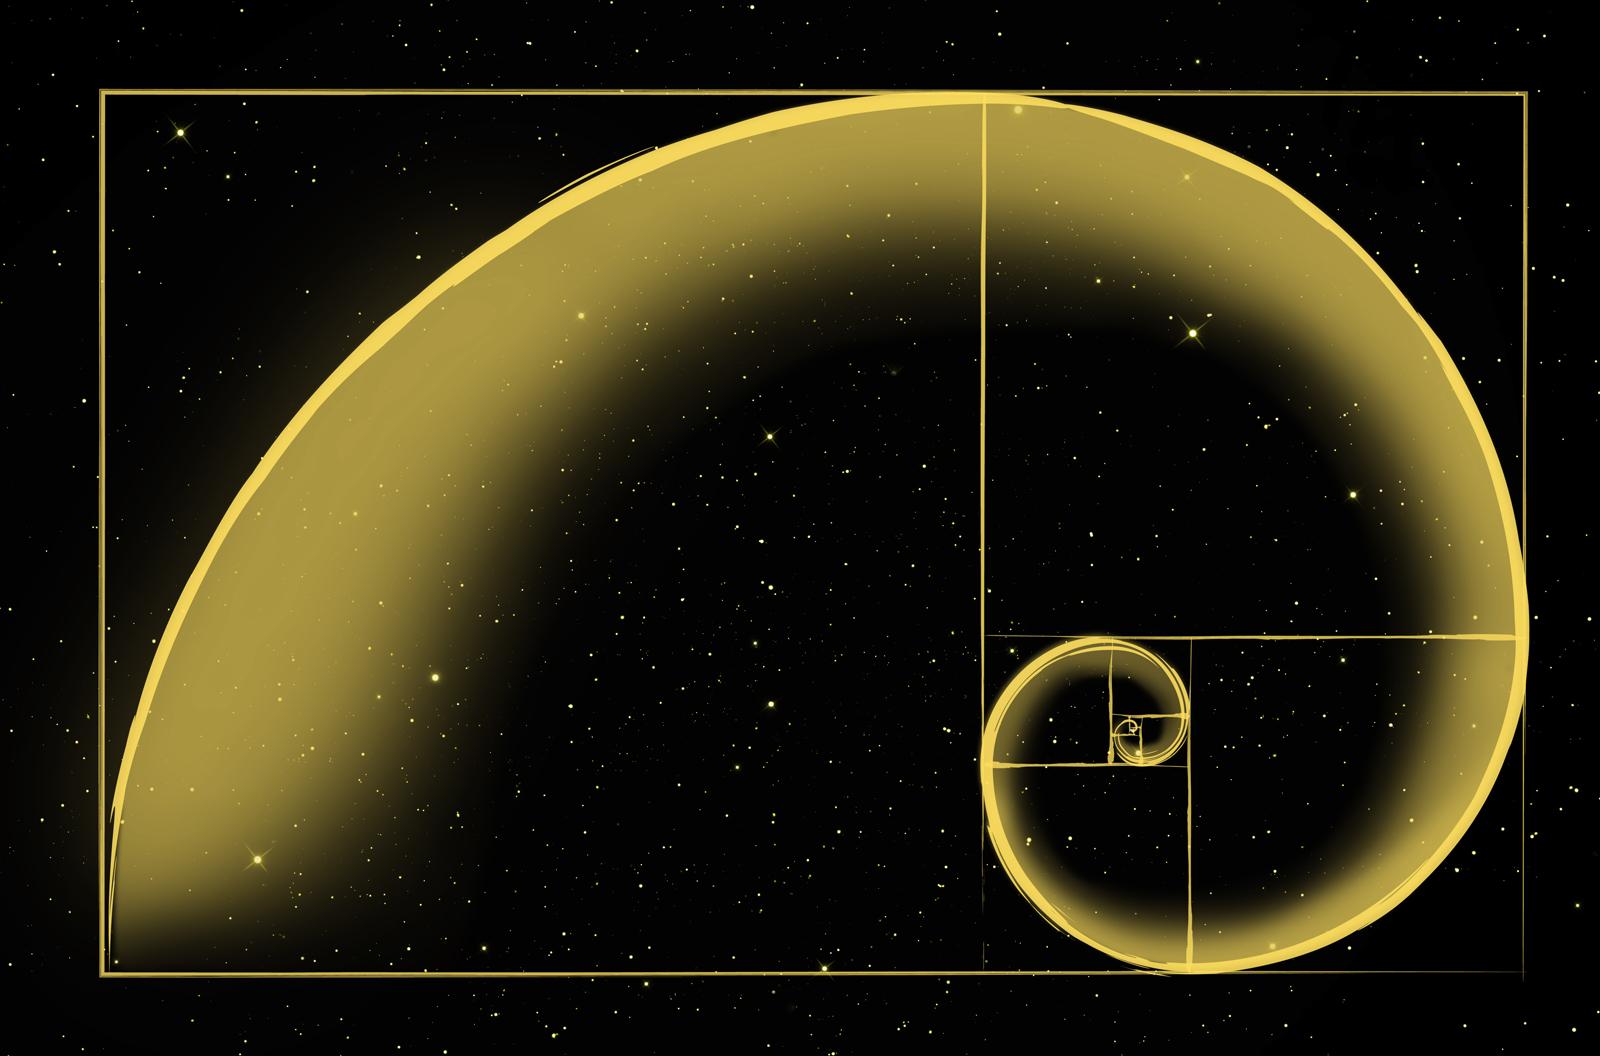 Illustration of the Golden Spiral on a black, starry background